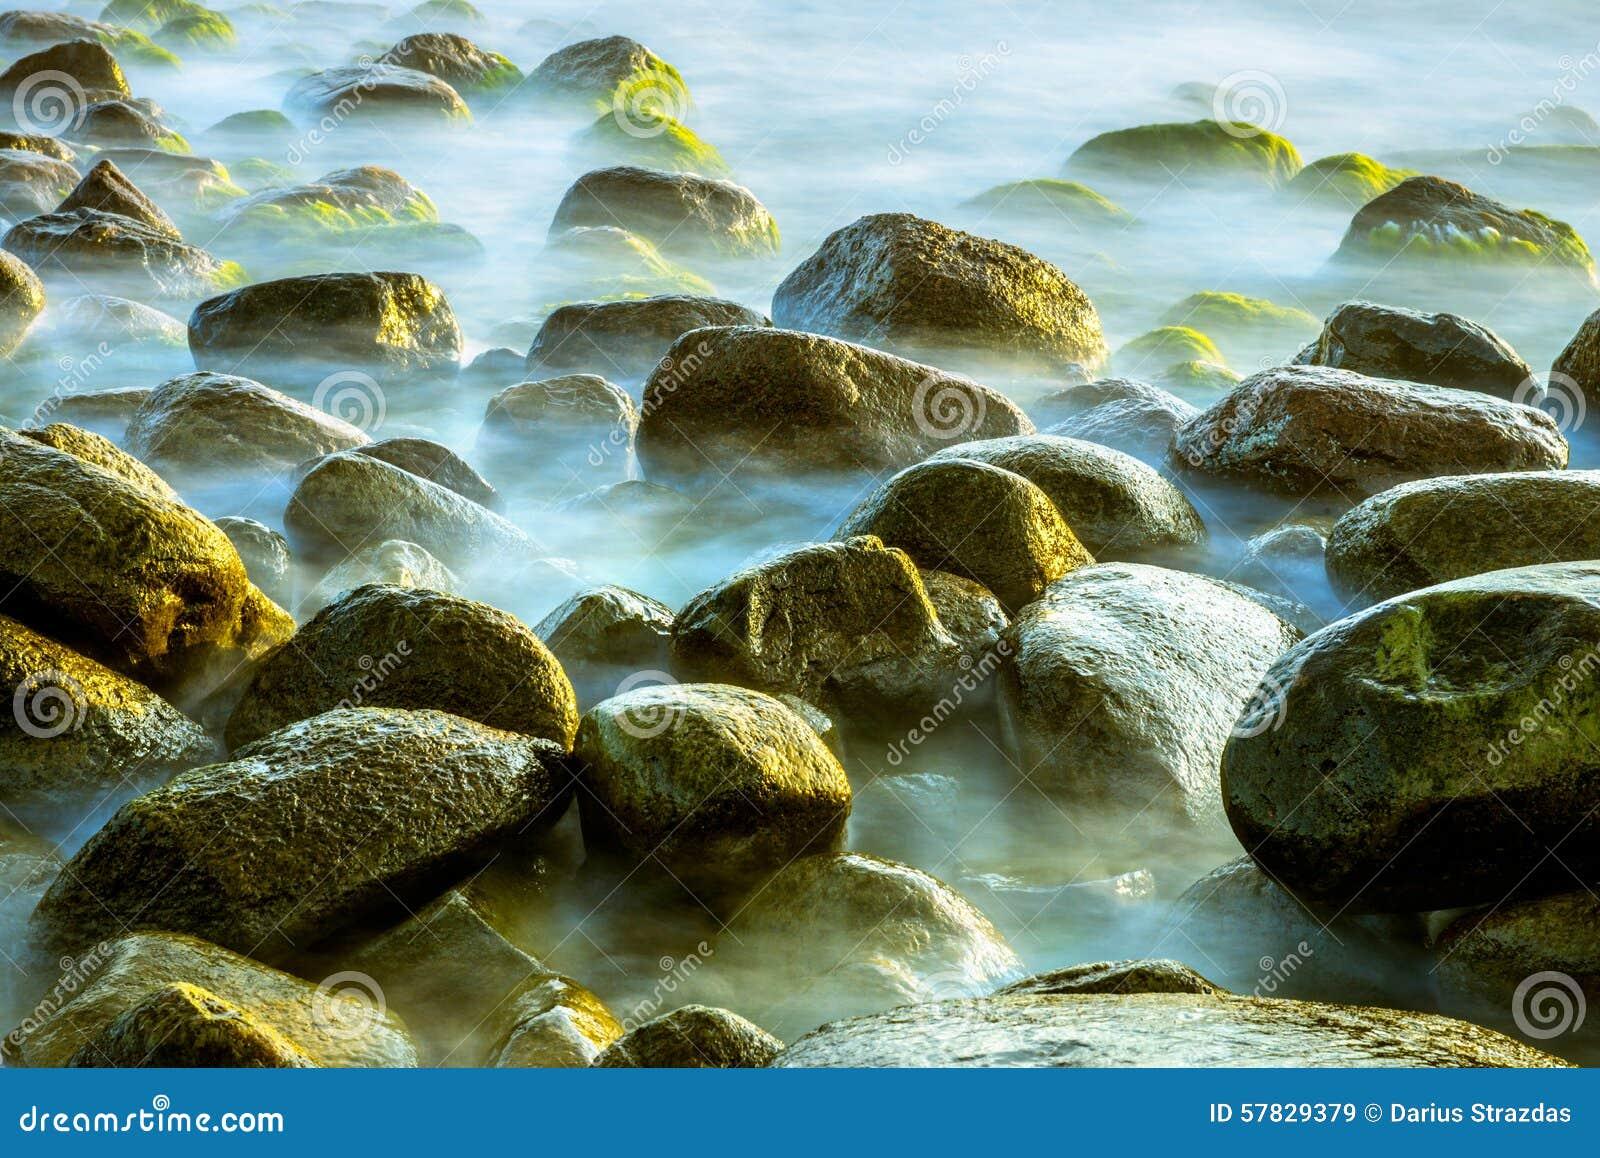 Sea scape with rocks